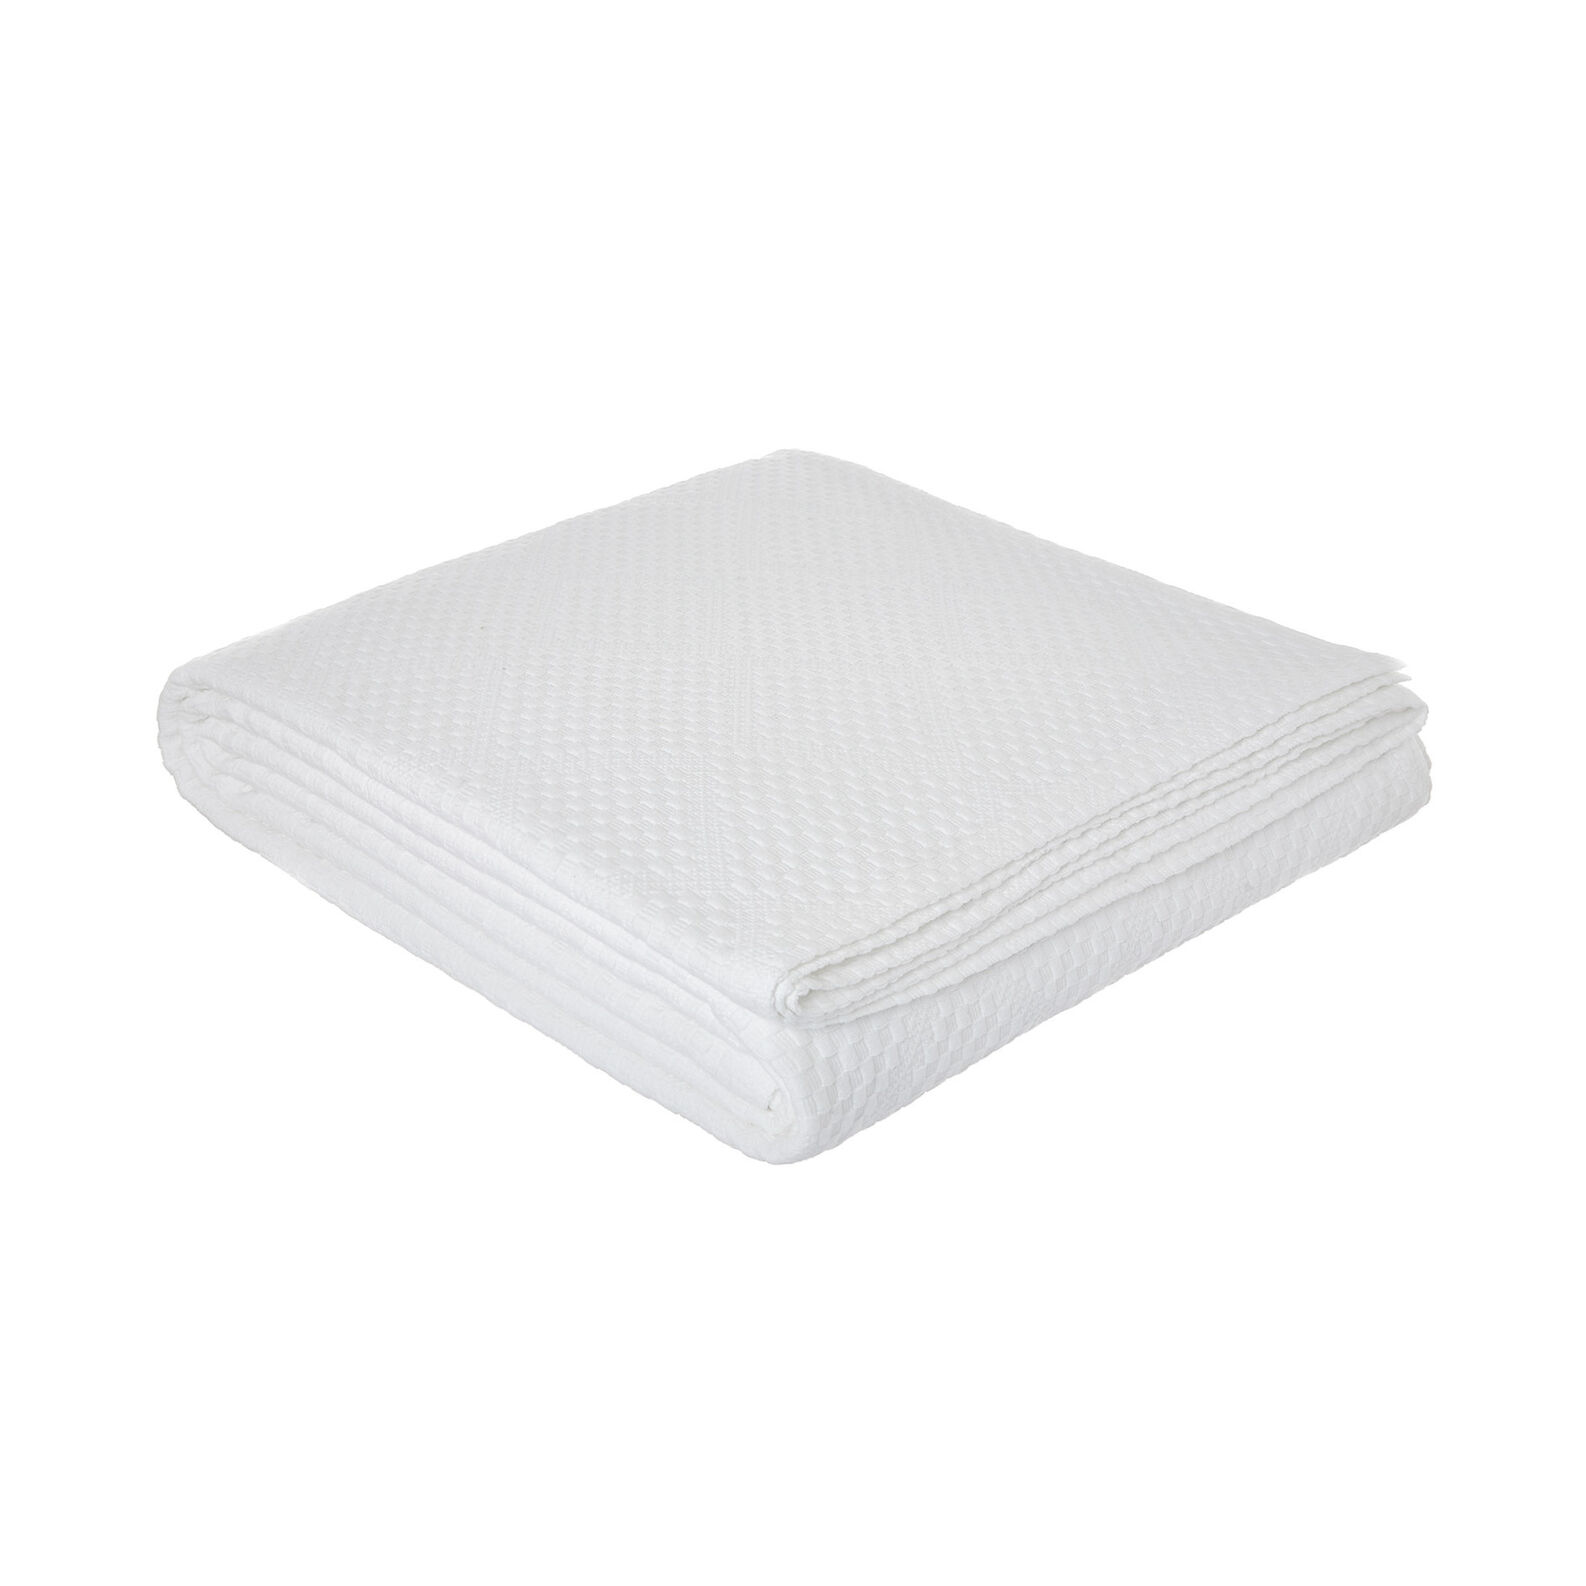 100% cotton bedspread with rhombus motif